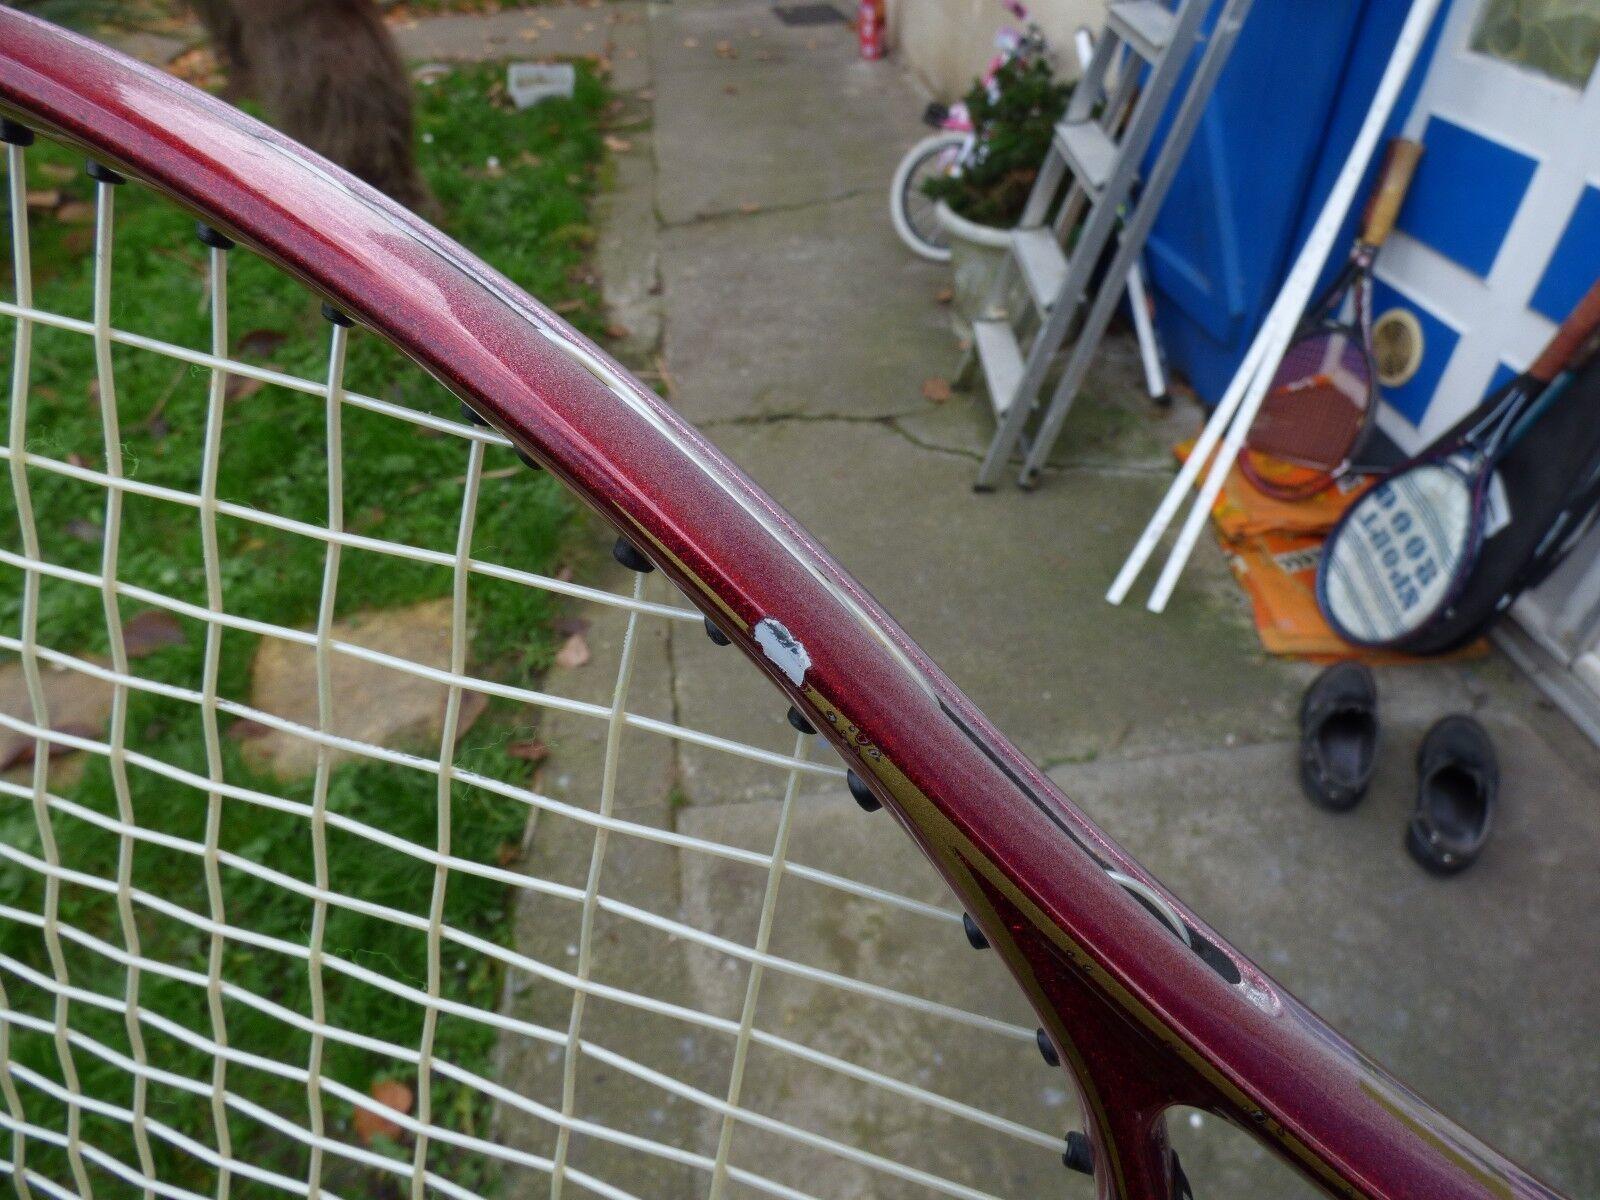 raquette de tennis Sting Wilson Sting tennis 2 grip 4 3/8 13ee0c